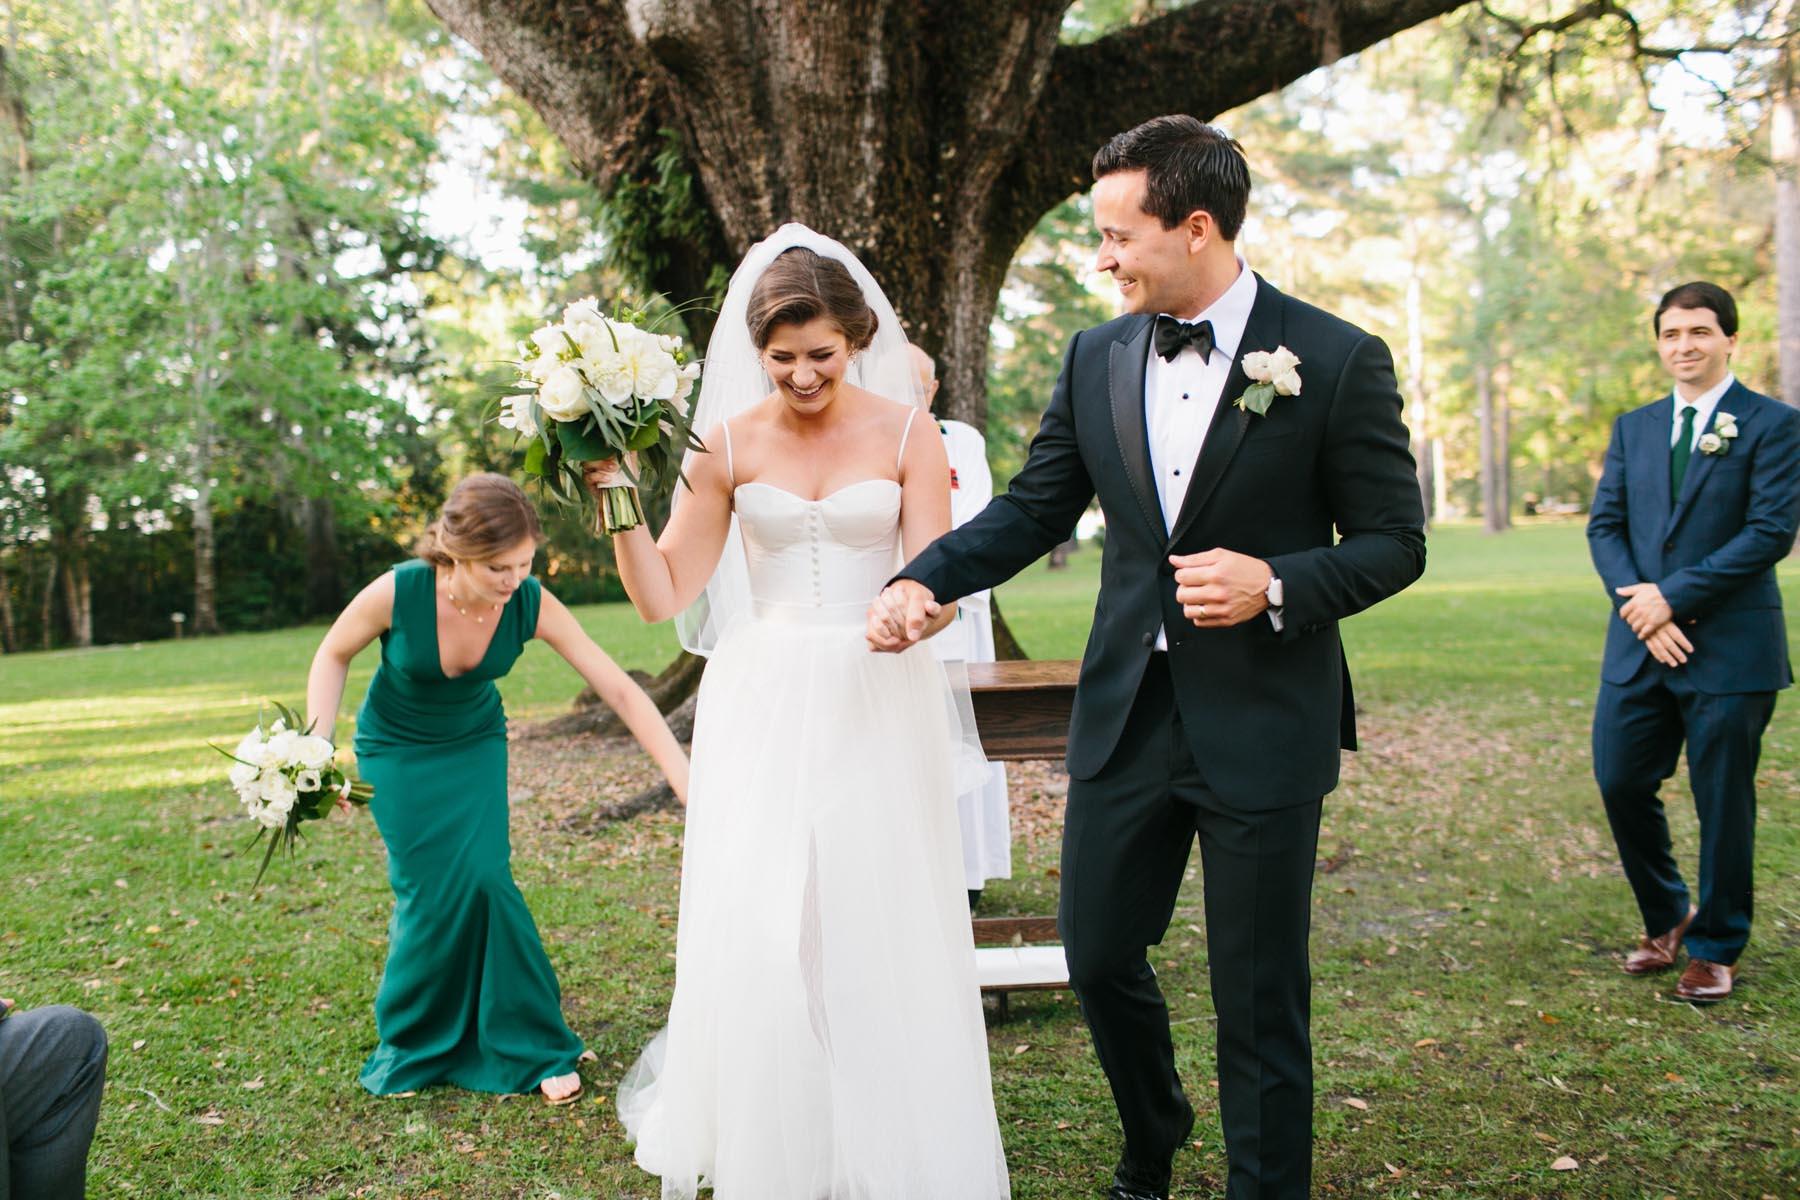 lowry wedding blog eden garden florida wedding-75